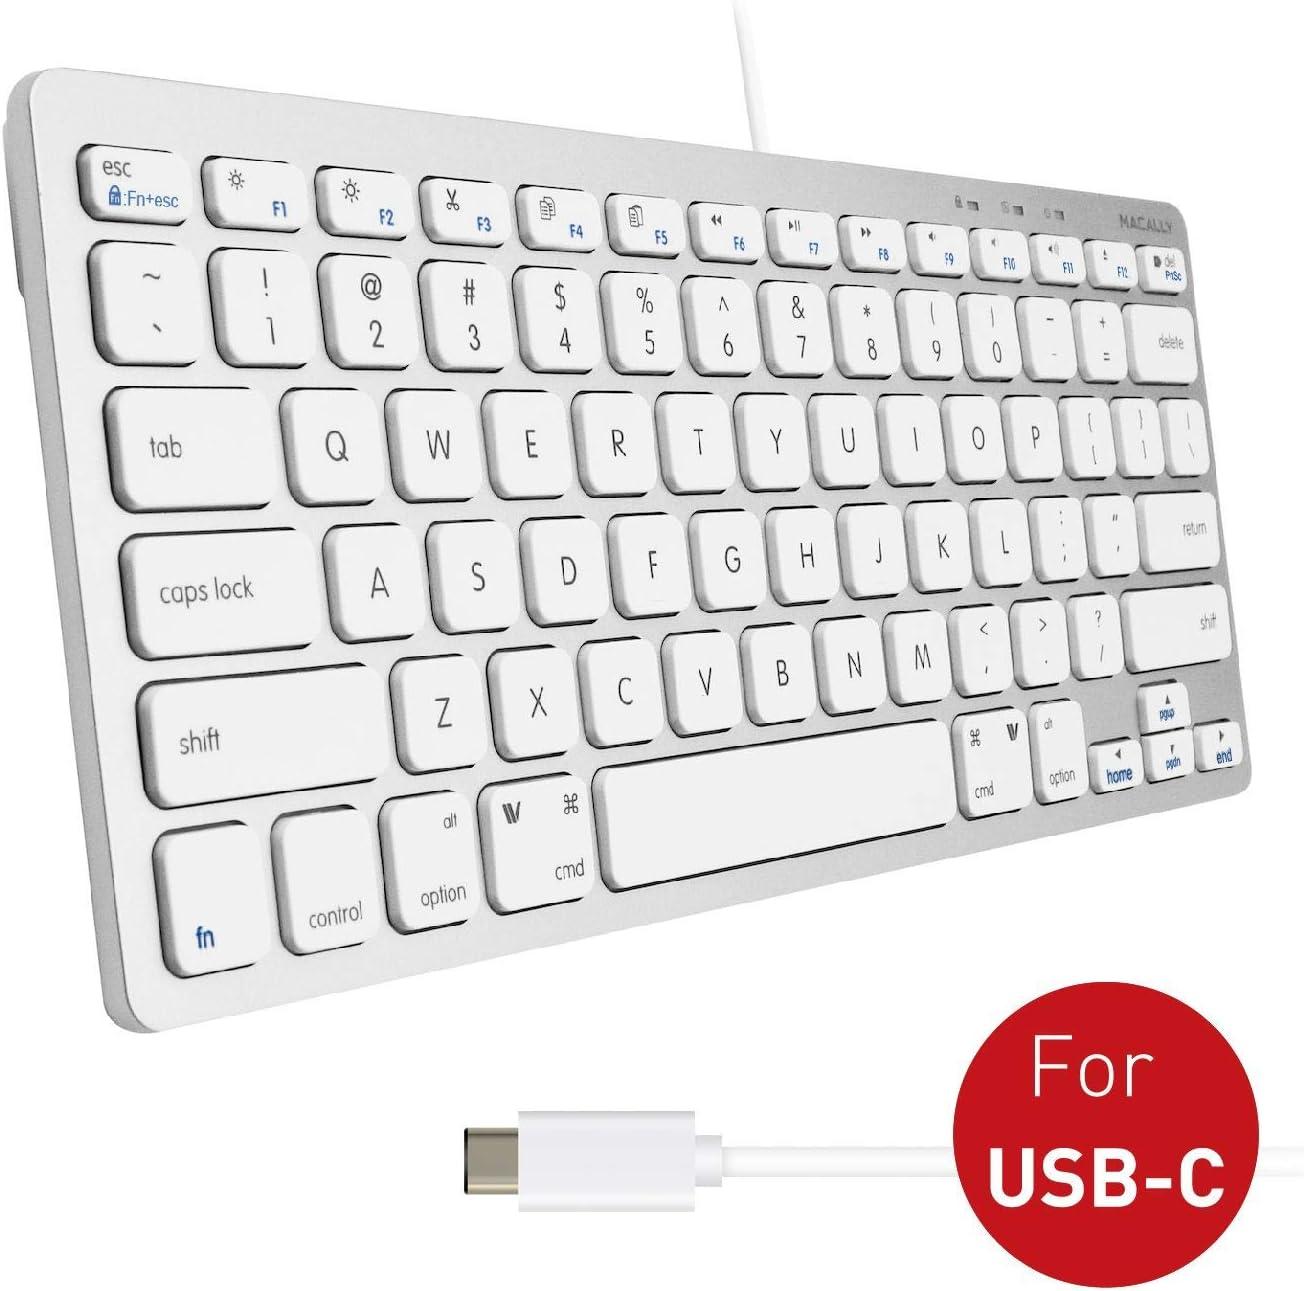 Macally Mini USB C Keyboard - Plug & Play Compact Keyboard for Mac, Windows, iPad, Android with USB C Port - 78 Scissor Switch Keycaps & 13 Shortcut Keys - Convenient & Small USB Type C Keyboard